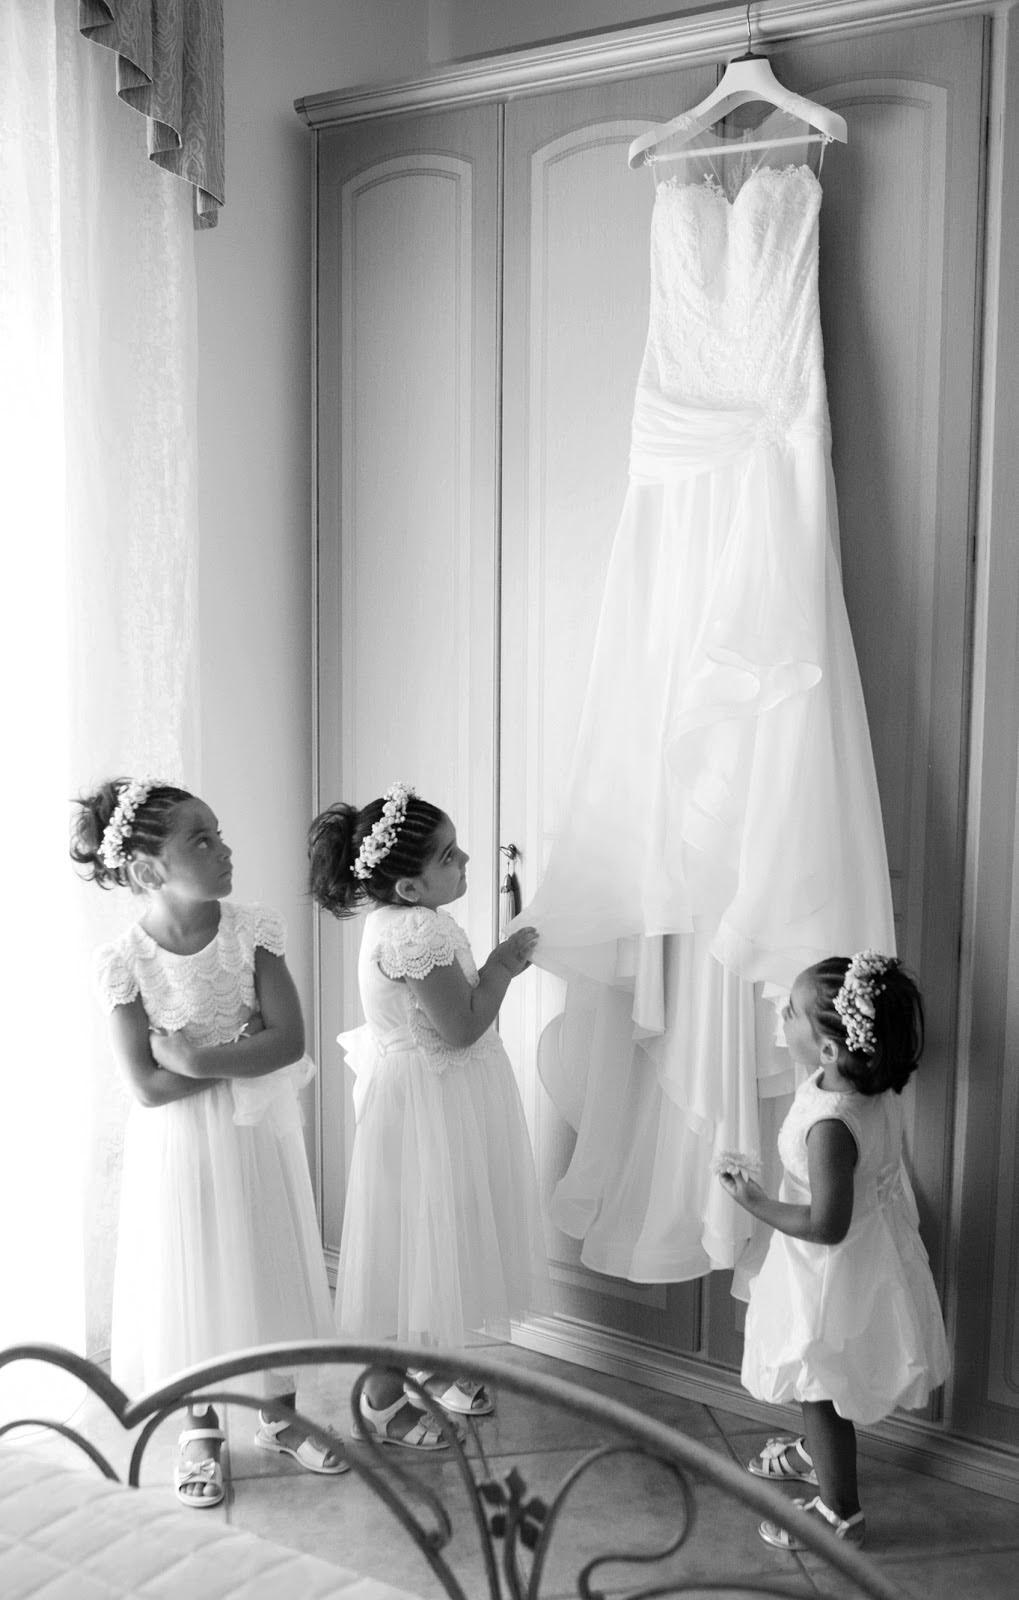 Fotografo Cava Dei Tirreni enzo gigantino (enzogigantino), fotografo di matrimoni da